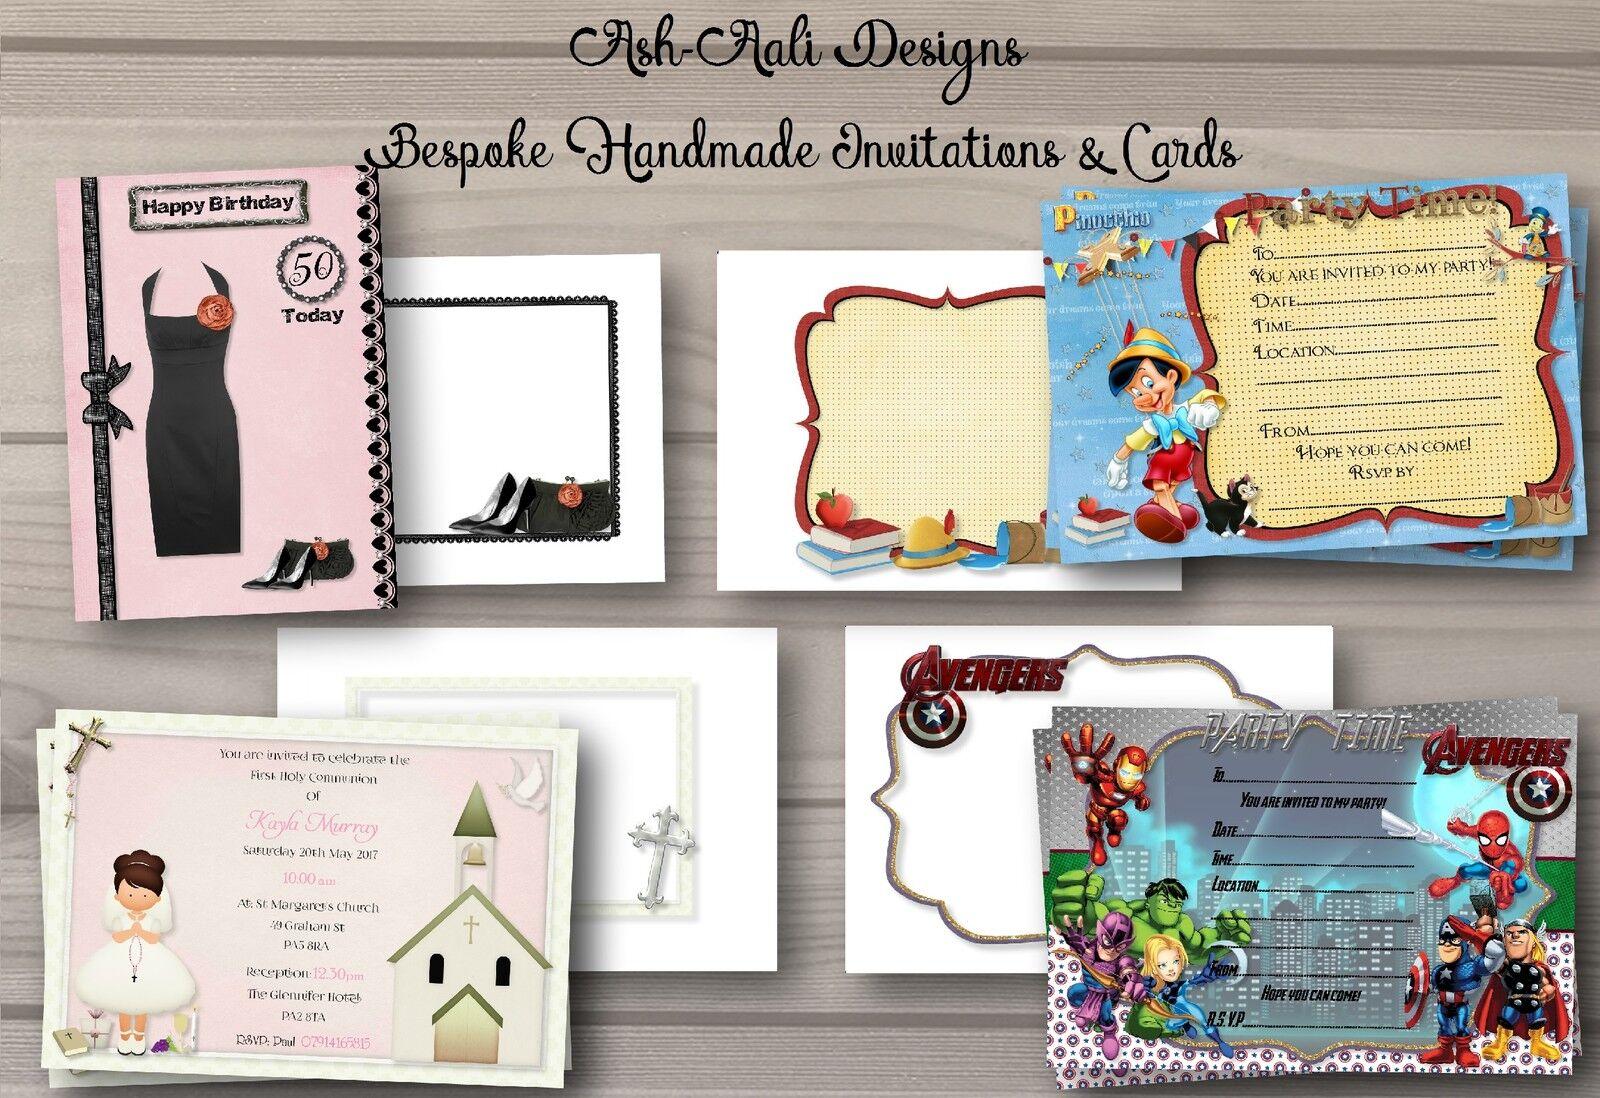 Ash-Aali Designs & simplyslimesuk